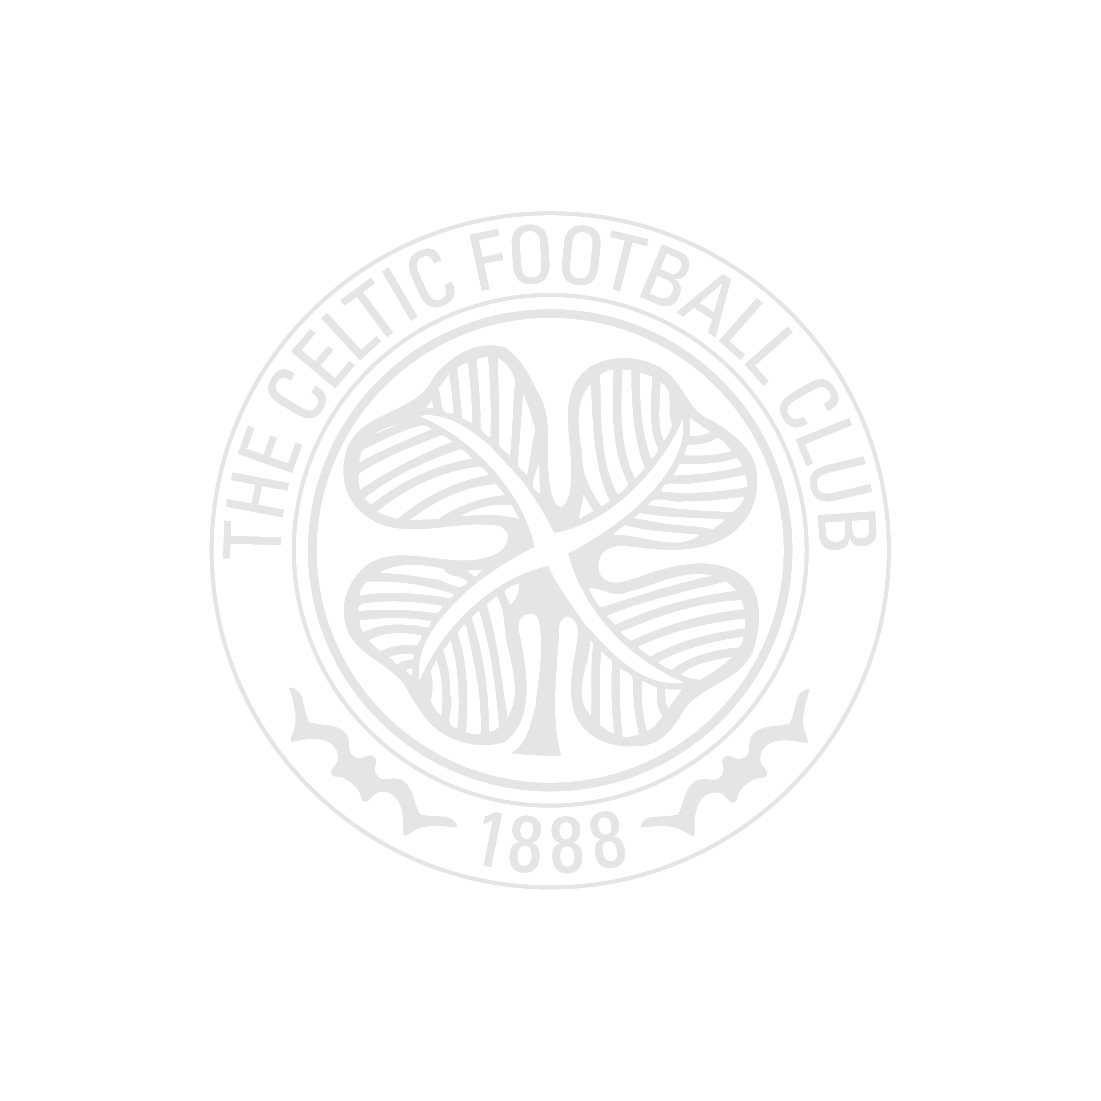 Celtic FC Bootbag